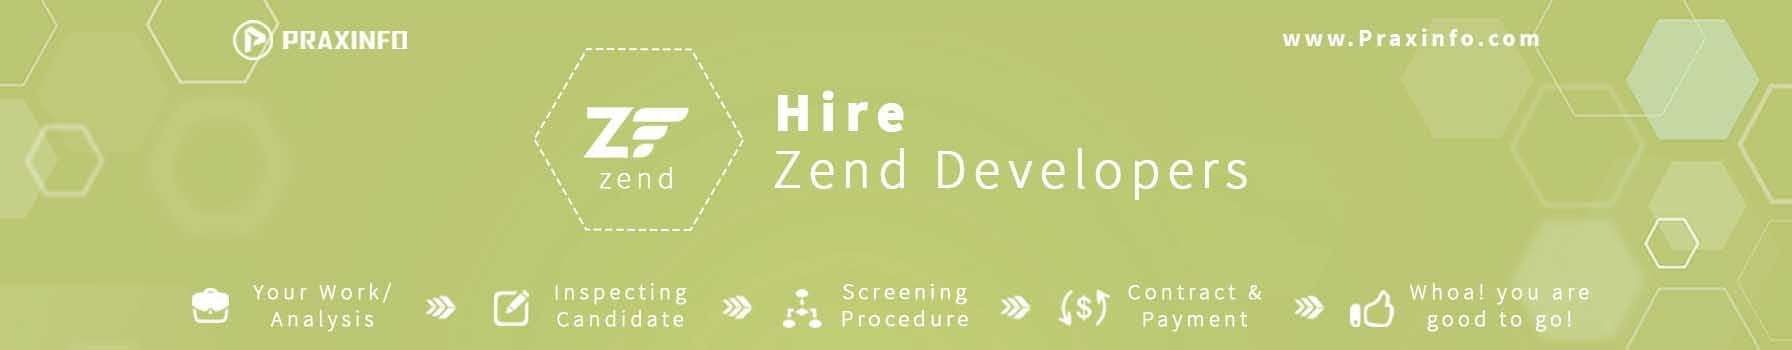 hire-Zend-developer.jpg